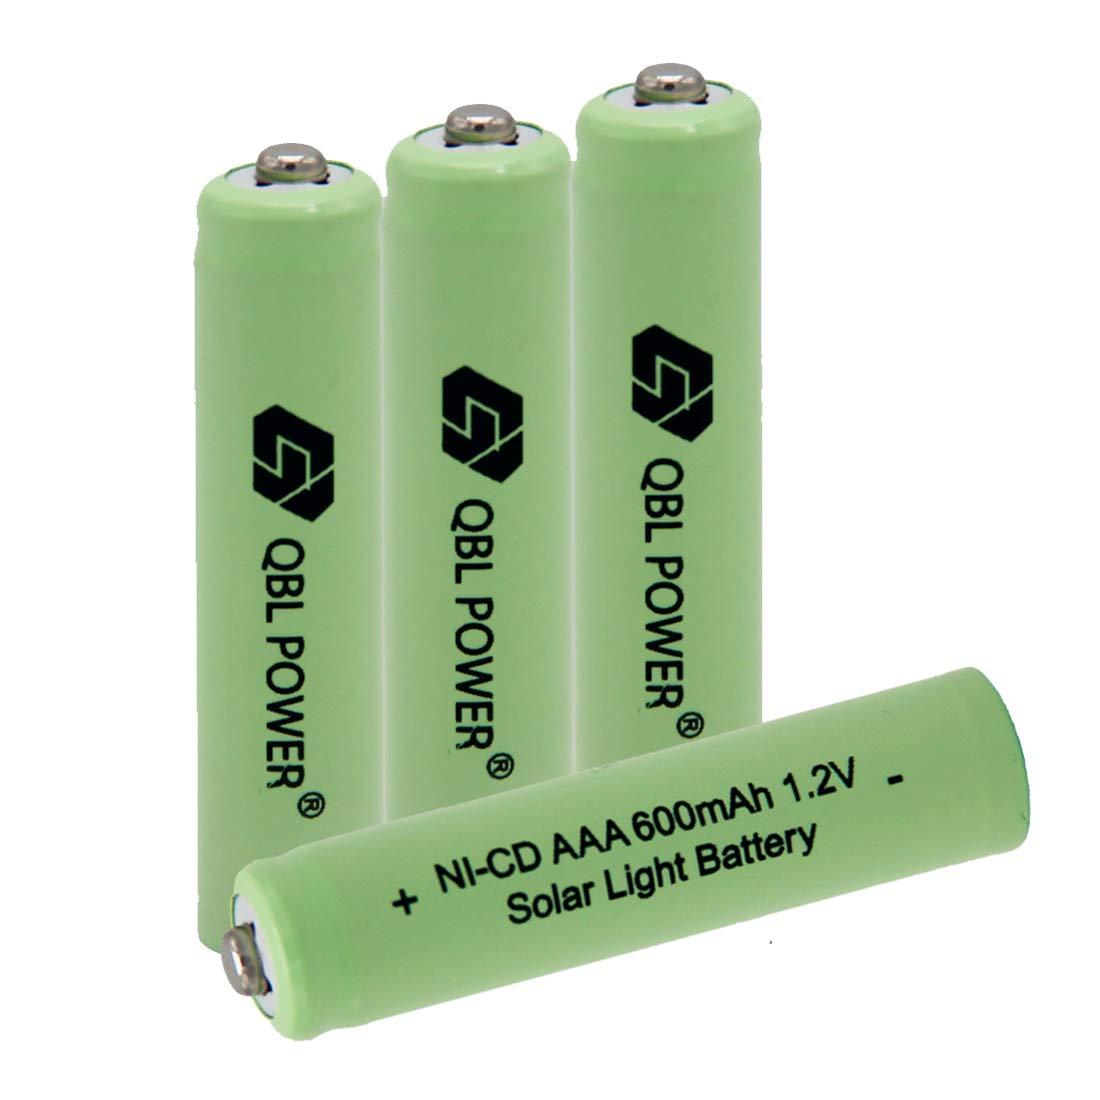 QBLPOWER 1.2v AAA NiCd 600mAh Triple A Rechargeable Battery Cell for Solar Lights Garden Lamp (4 Pcs AAA NiCd 600mAh(Green))